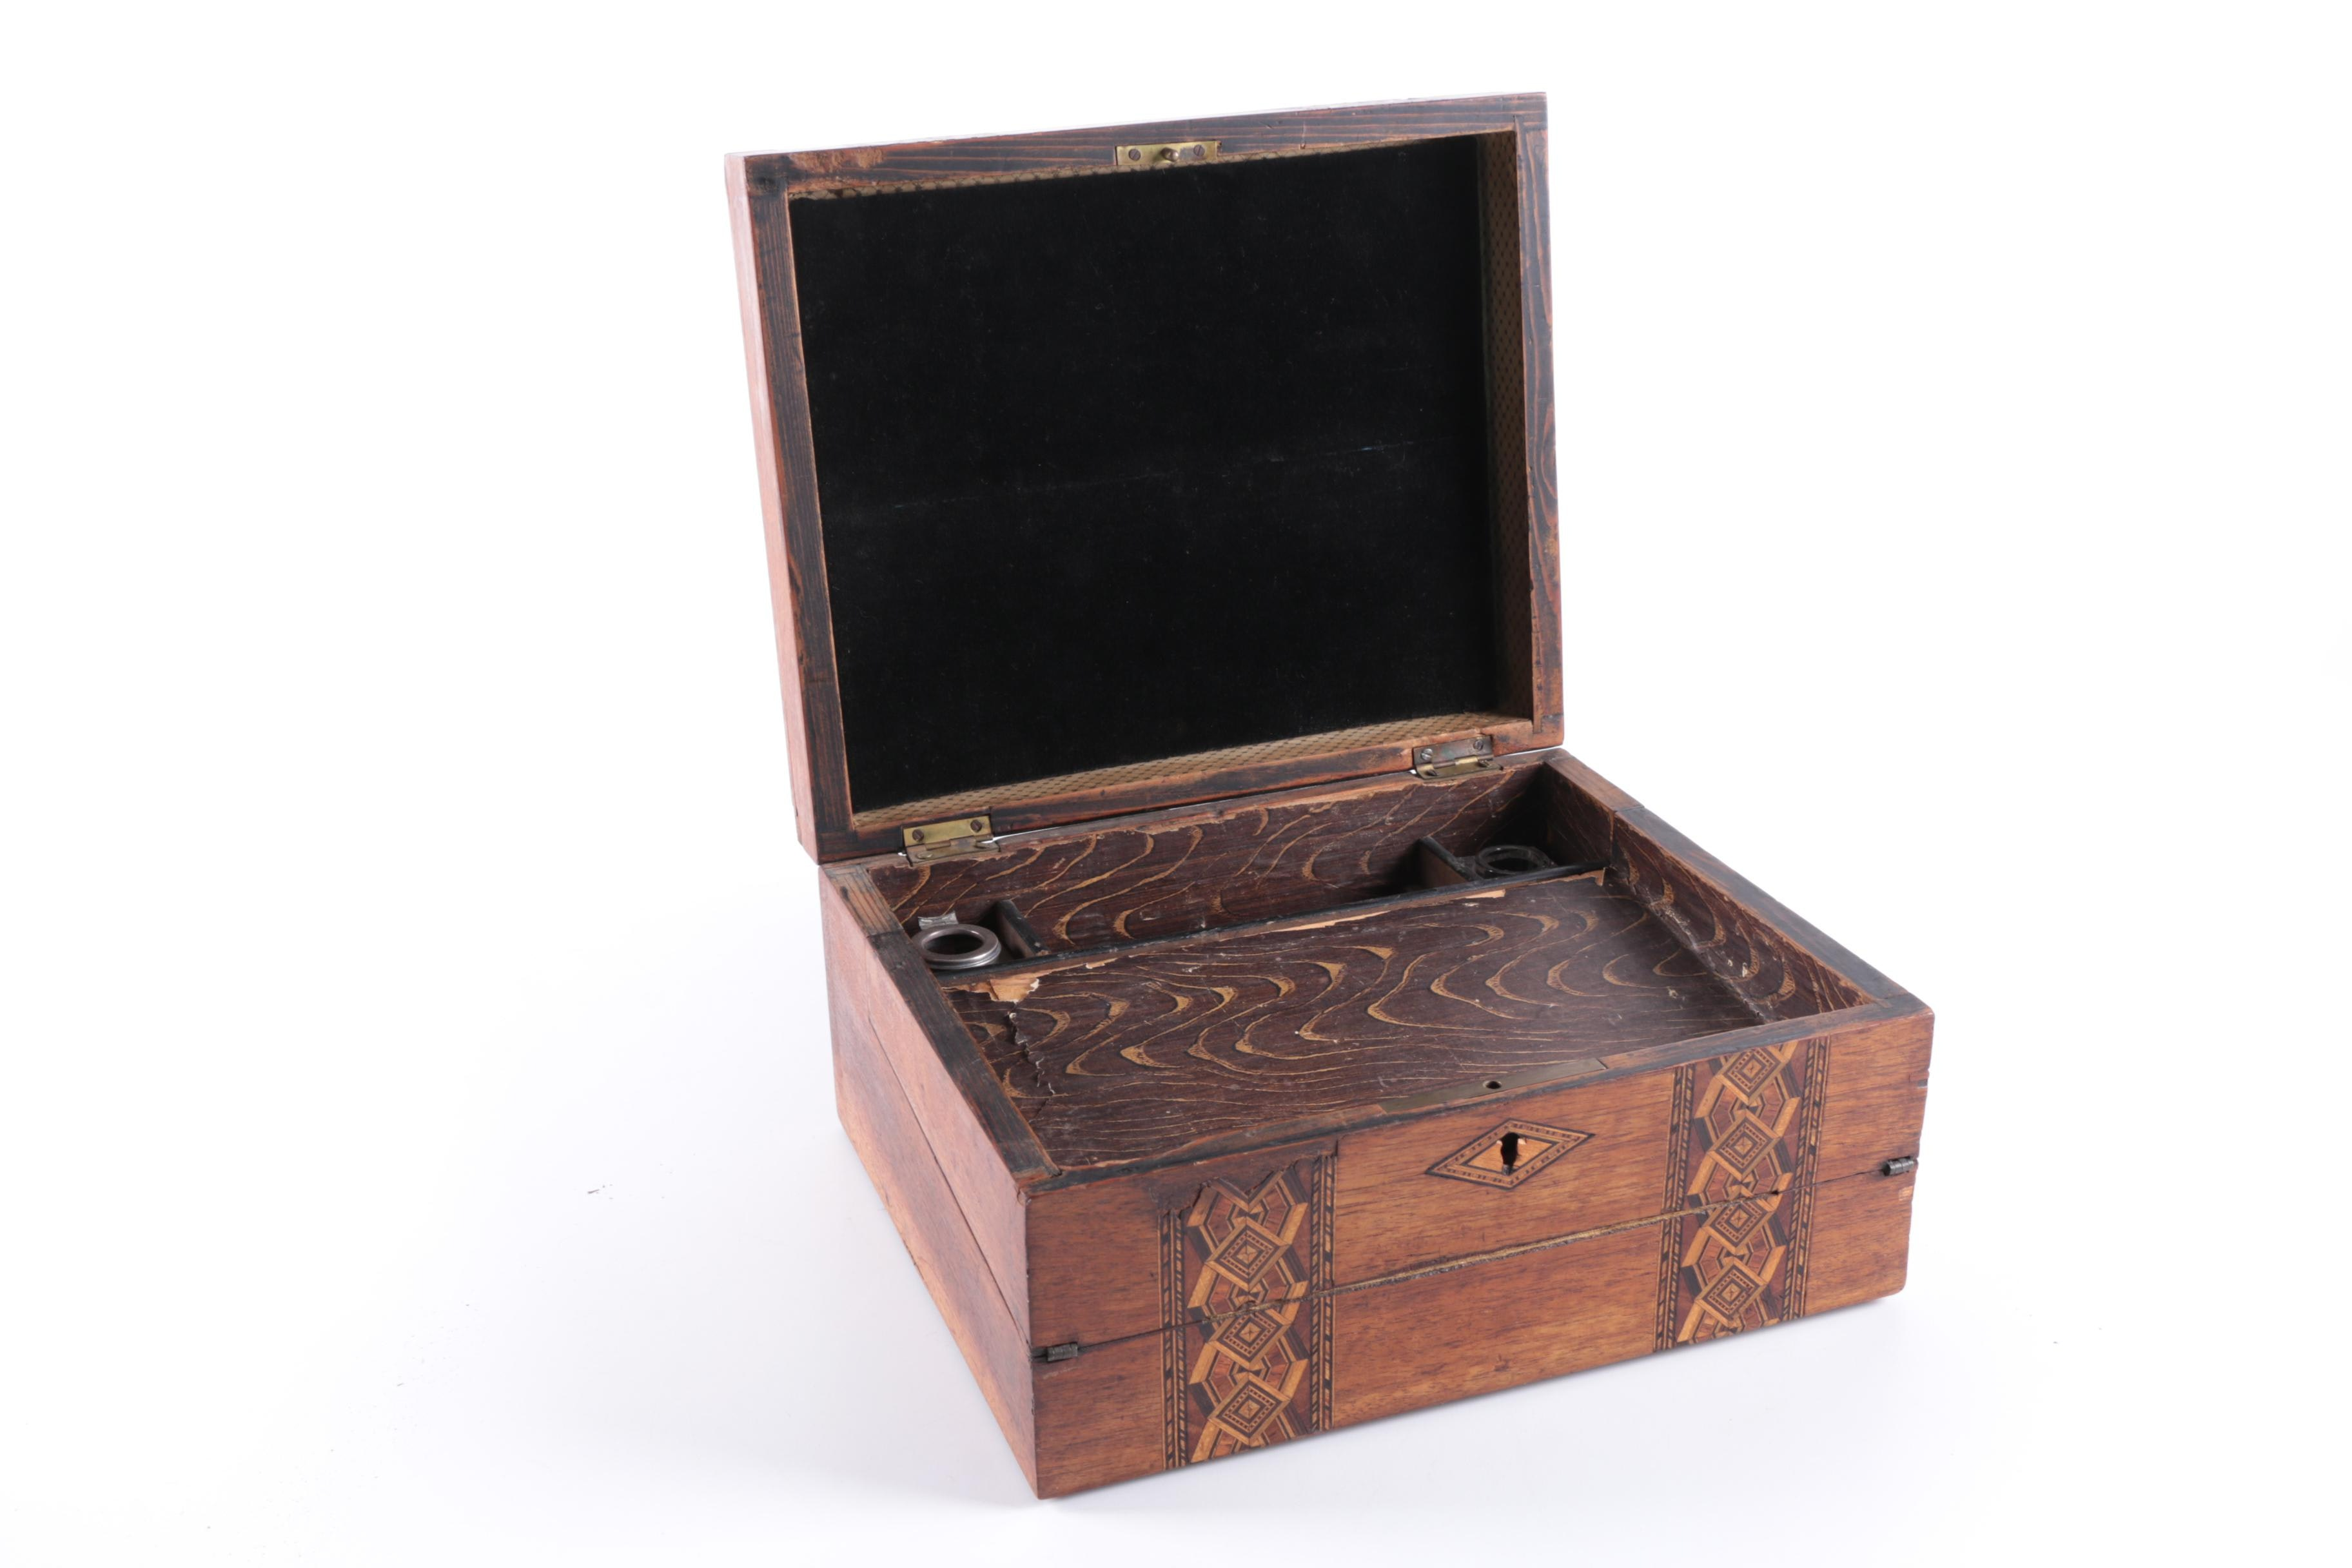 19th Century Early Tunbridgeware Walnut Lap Desk